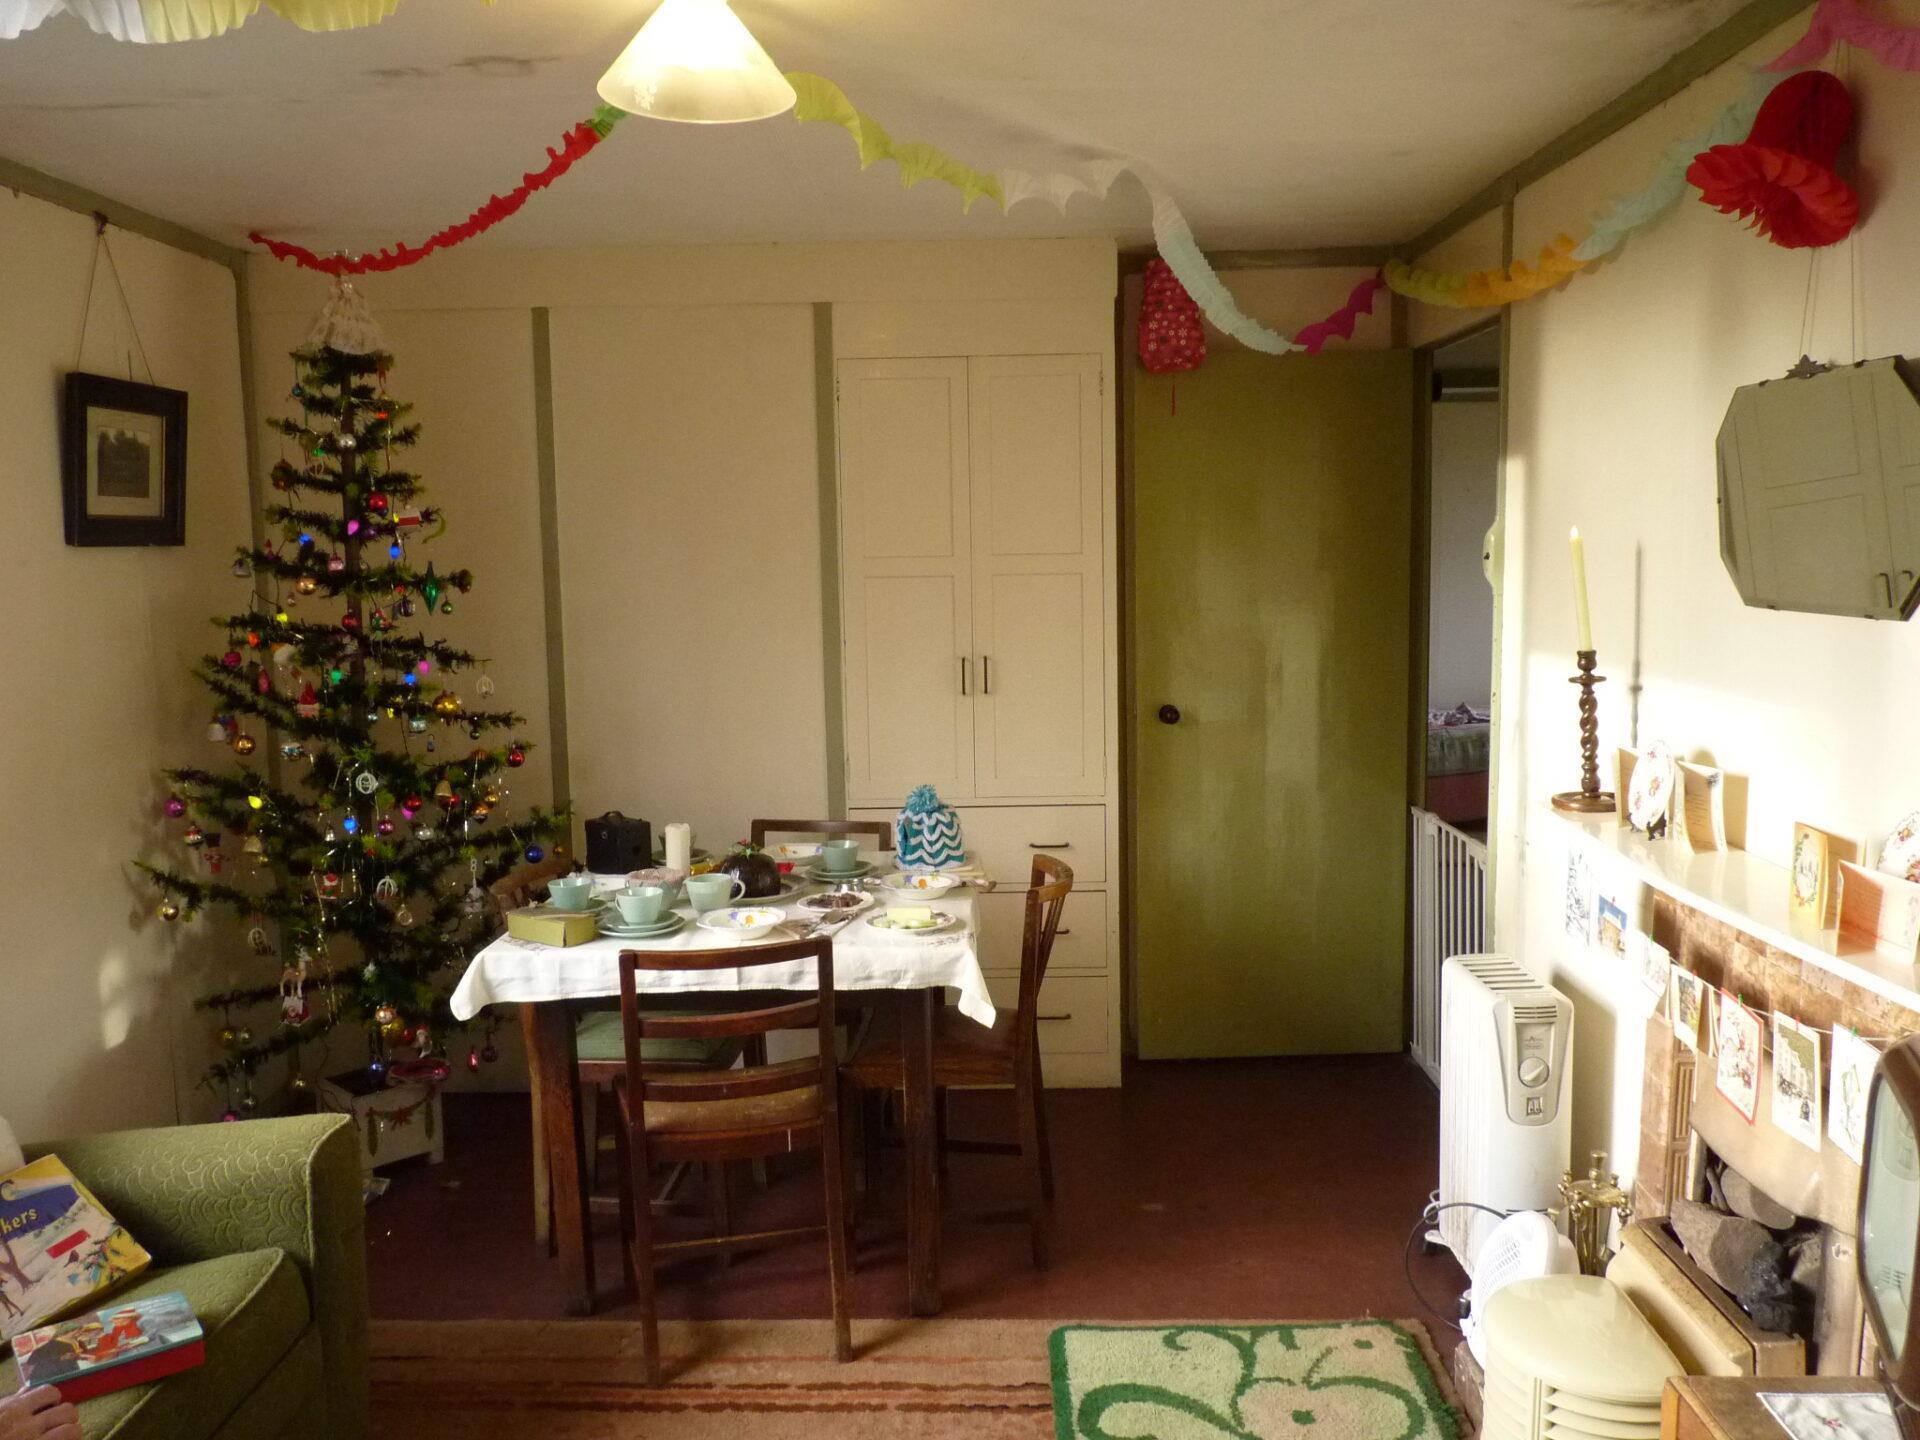 Christmas evening at Avoncroft 1800-1950 – 11th December 2021  (17.00 – 22.00)